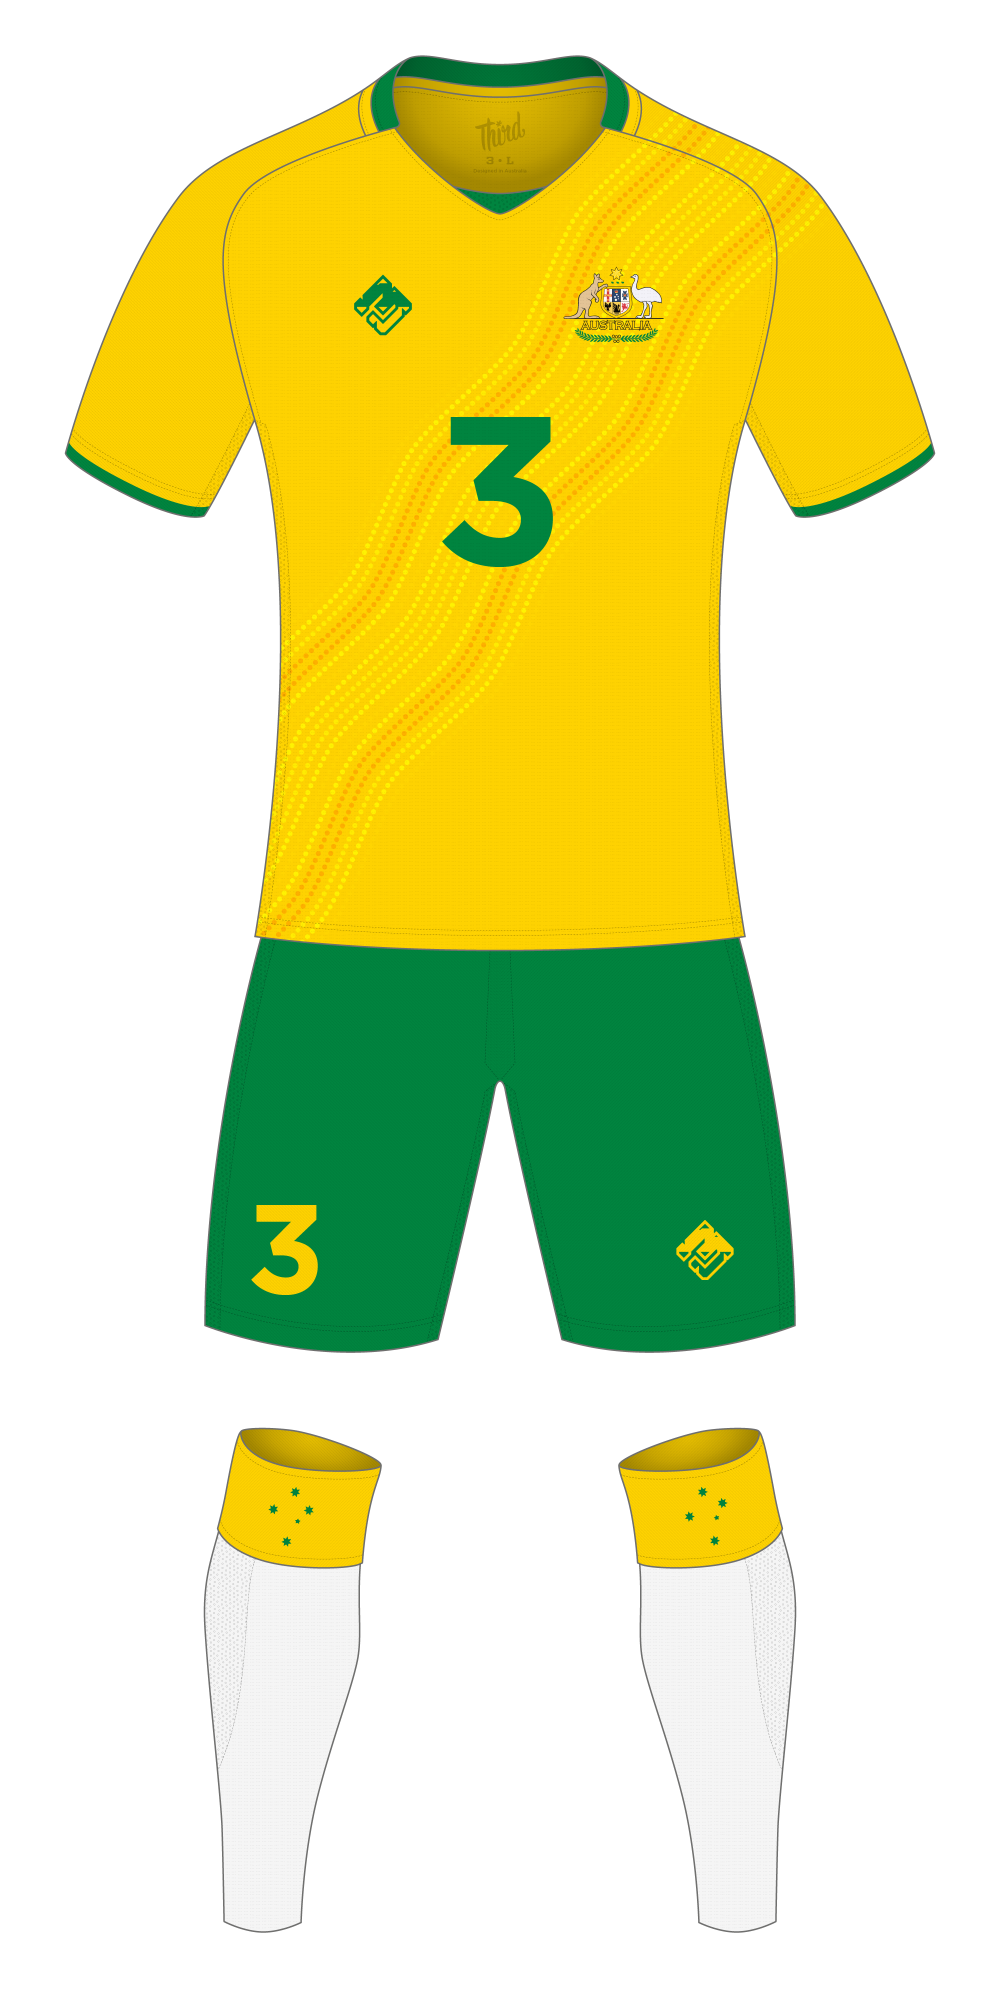 Australia World Cup 2018 concept